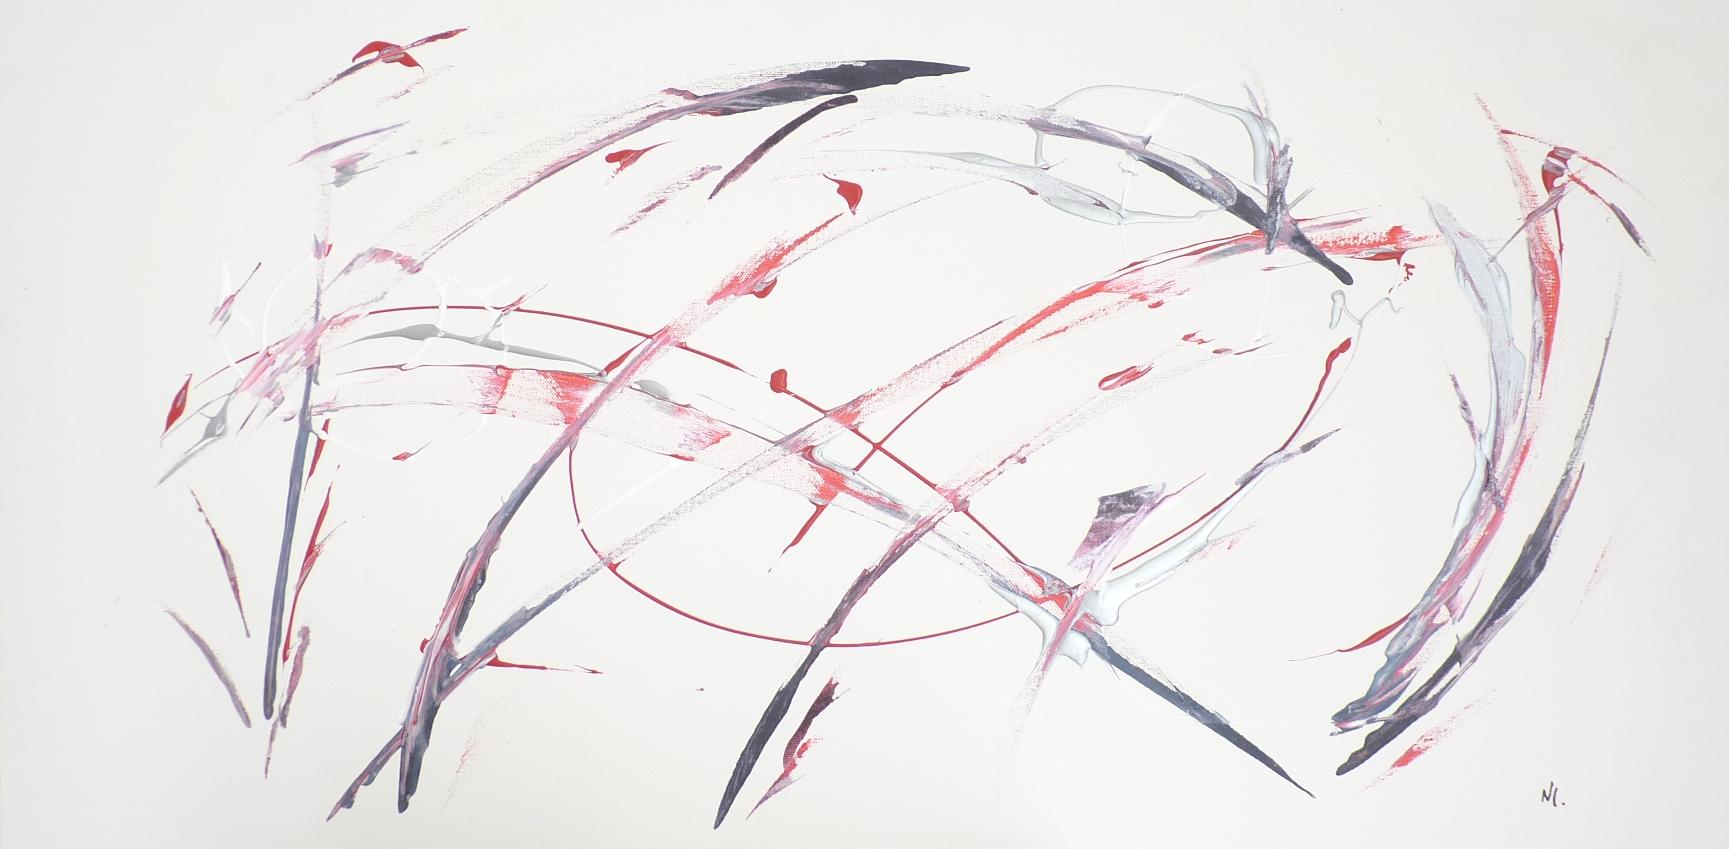 Peinture sur toile (TO-02)